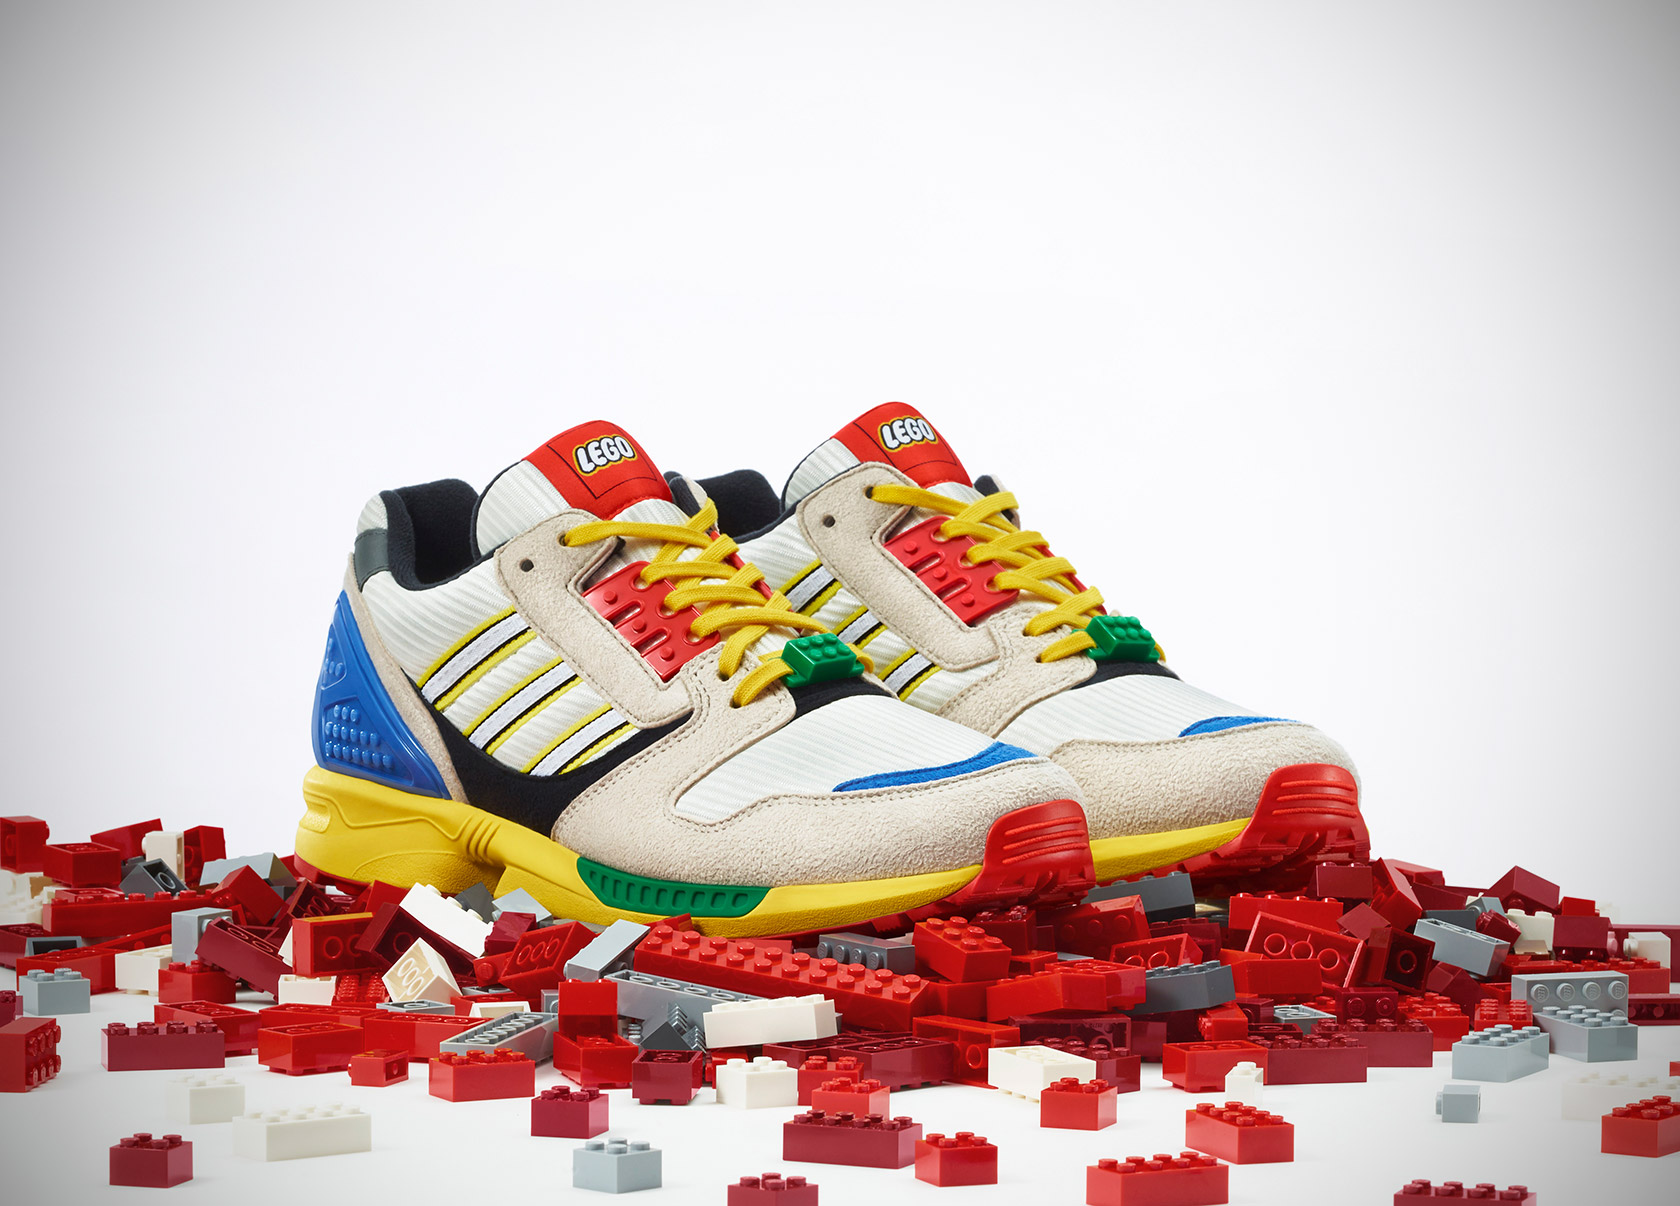 LEGO x Adidas Originals ZX8000 Sneakers